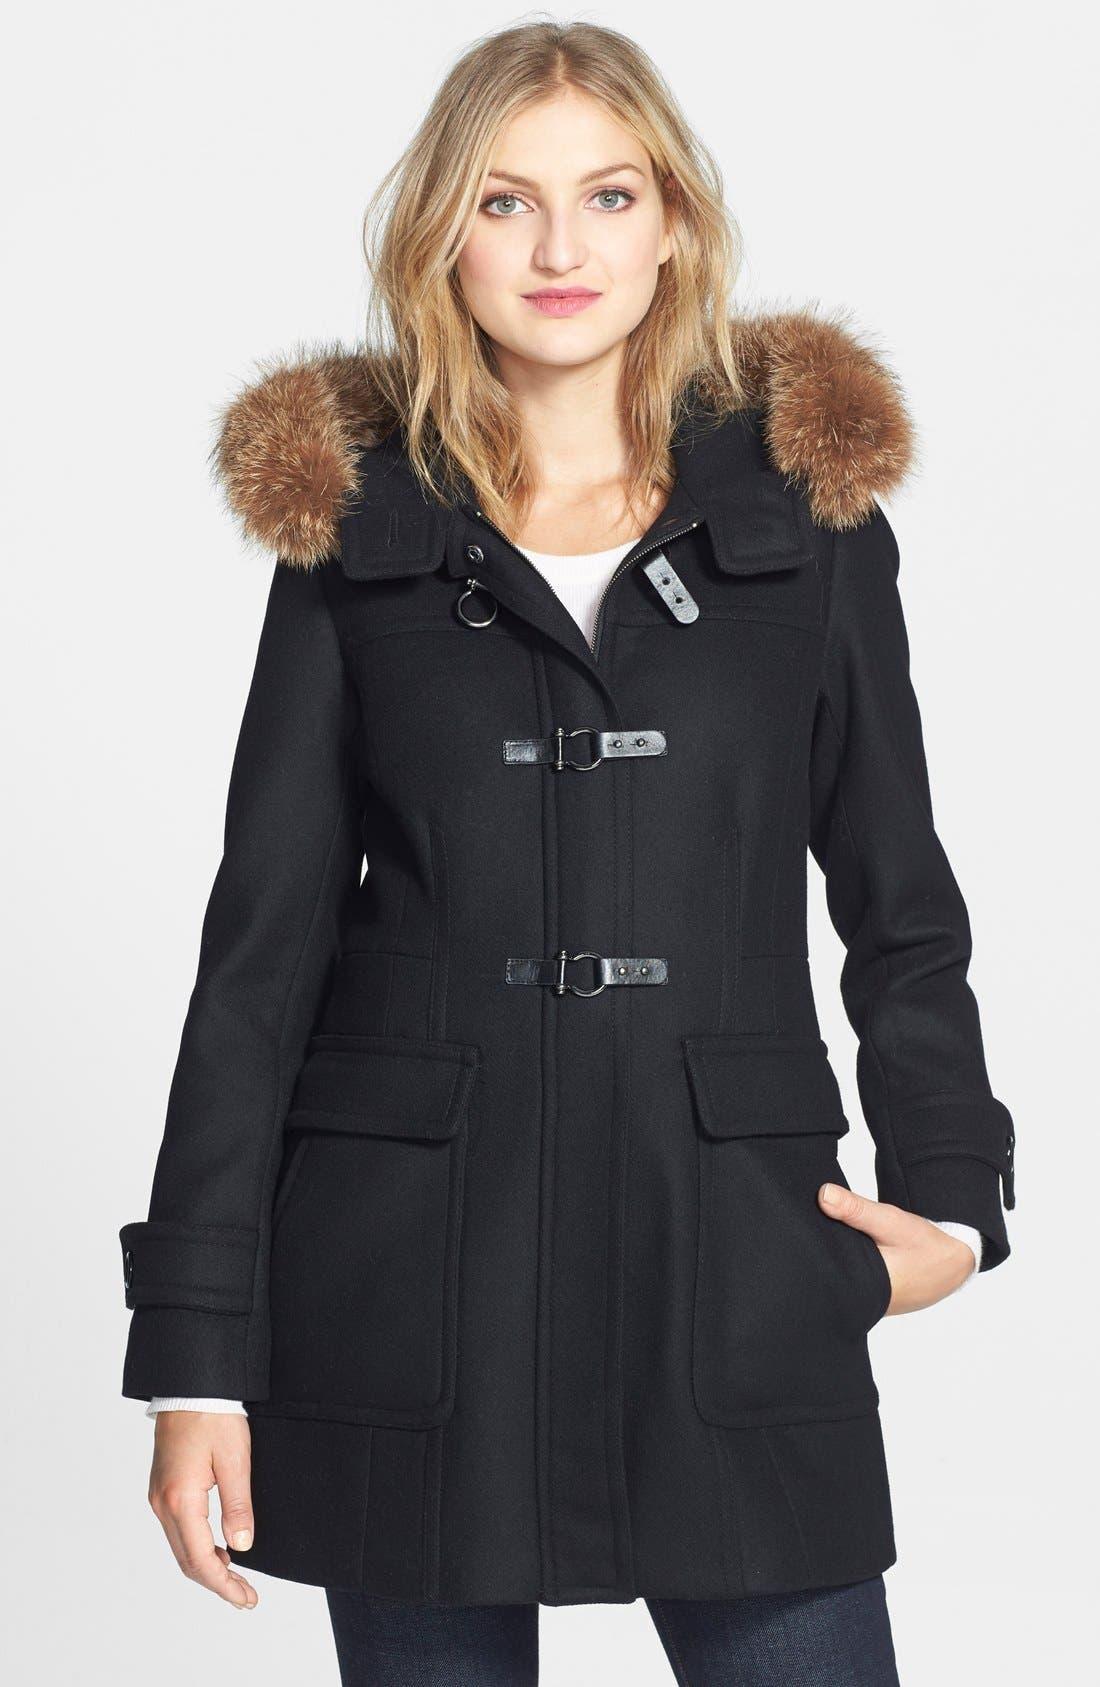 Main Image - Trina Turk Genuine Coyote Fur Trim Wool Blend Duffle Coat